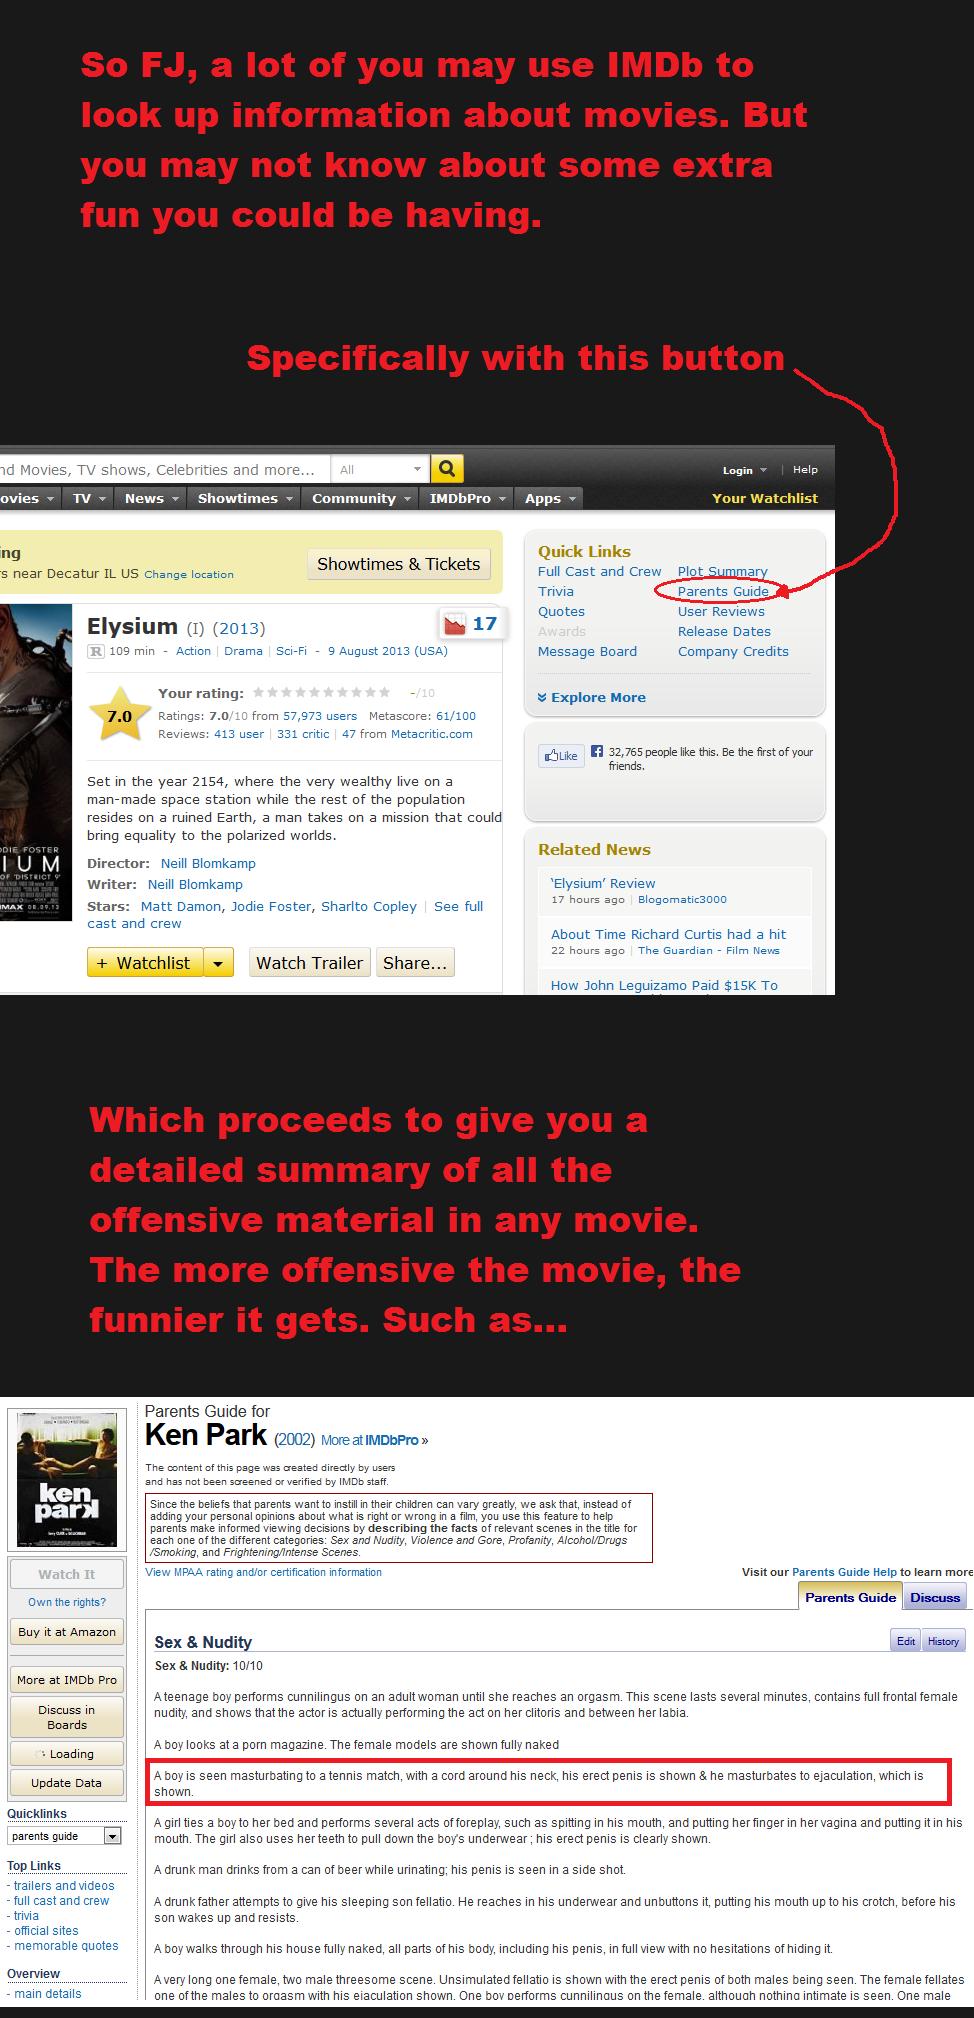 "IMDb. . was and nip ttm . . all E Lupin Help ovaries v TV v News v showtimes v Community v v Apps v Your watchlist Showtimes at 1"" tikets I ' User Reviews Elysi"